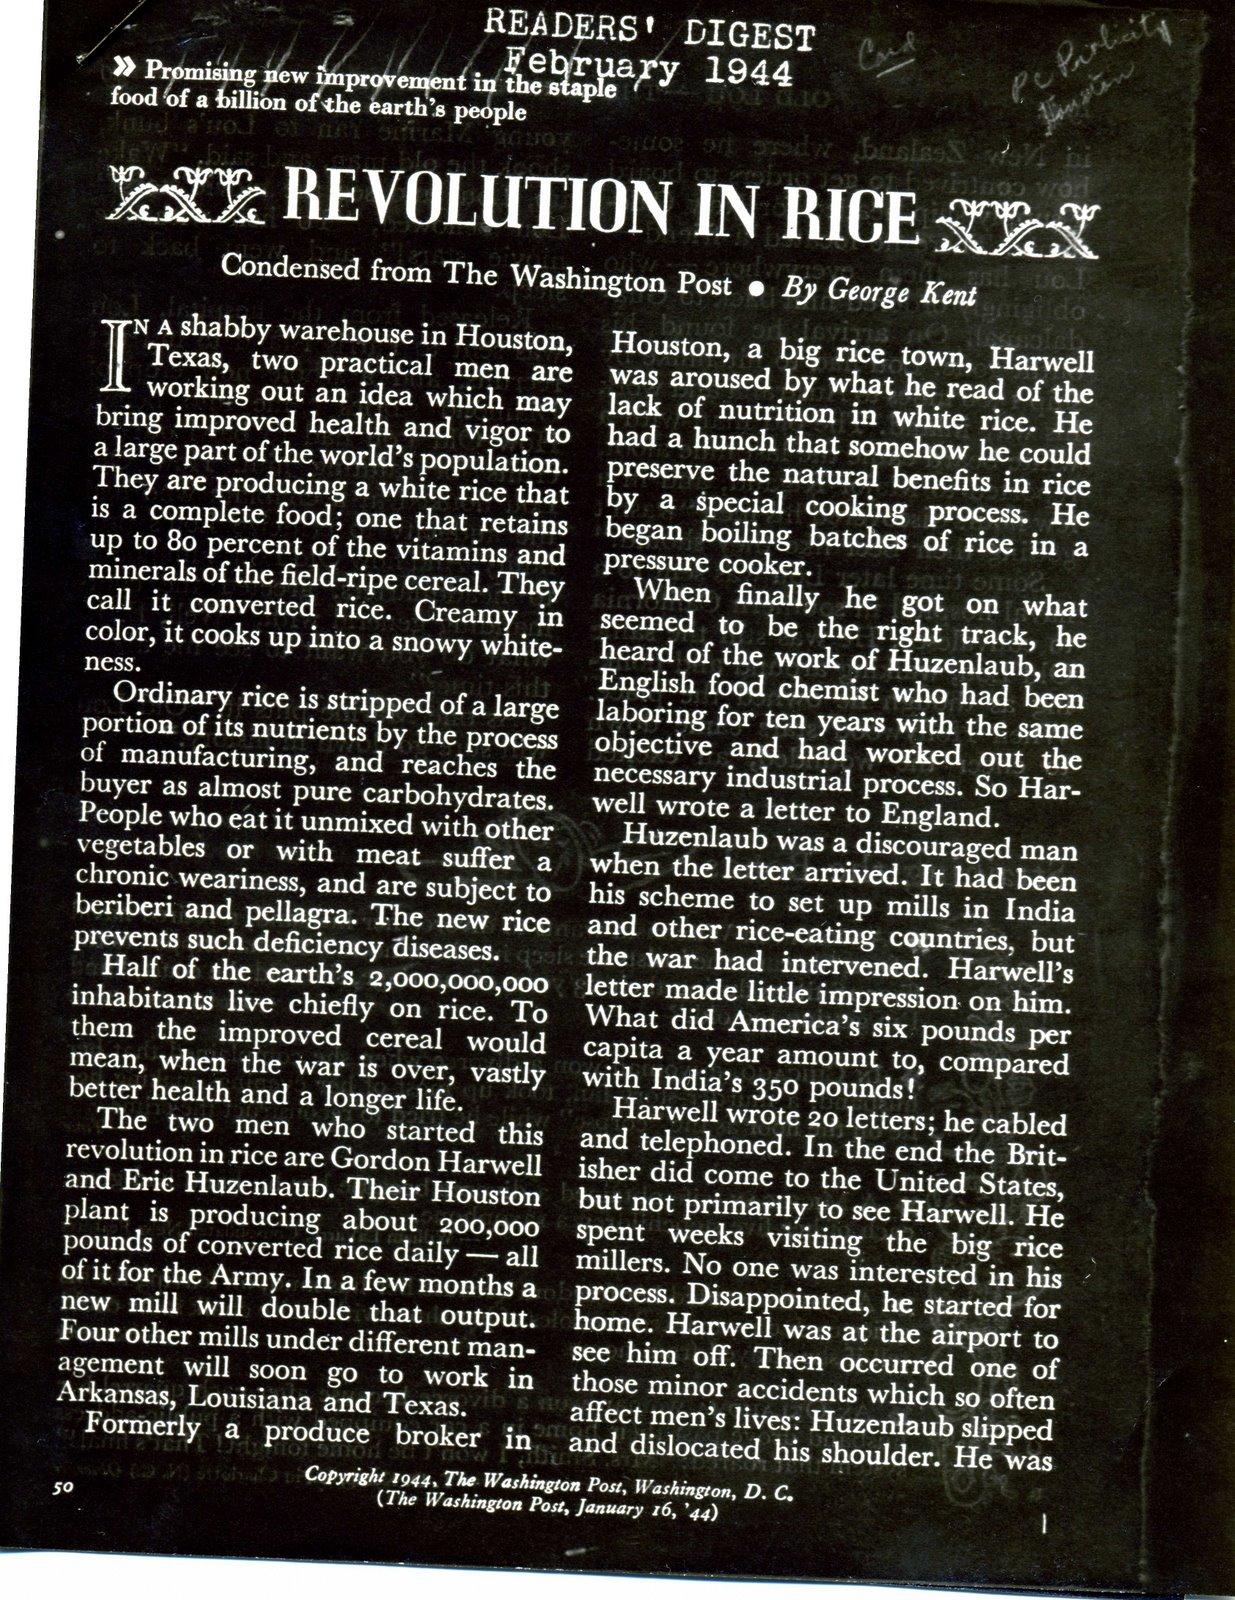 [Reader's+Digest+Revolution+in+Rice+Uncle+Ben's+Page+1.jpg]